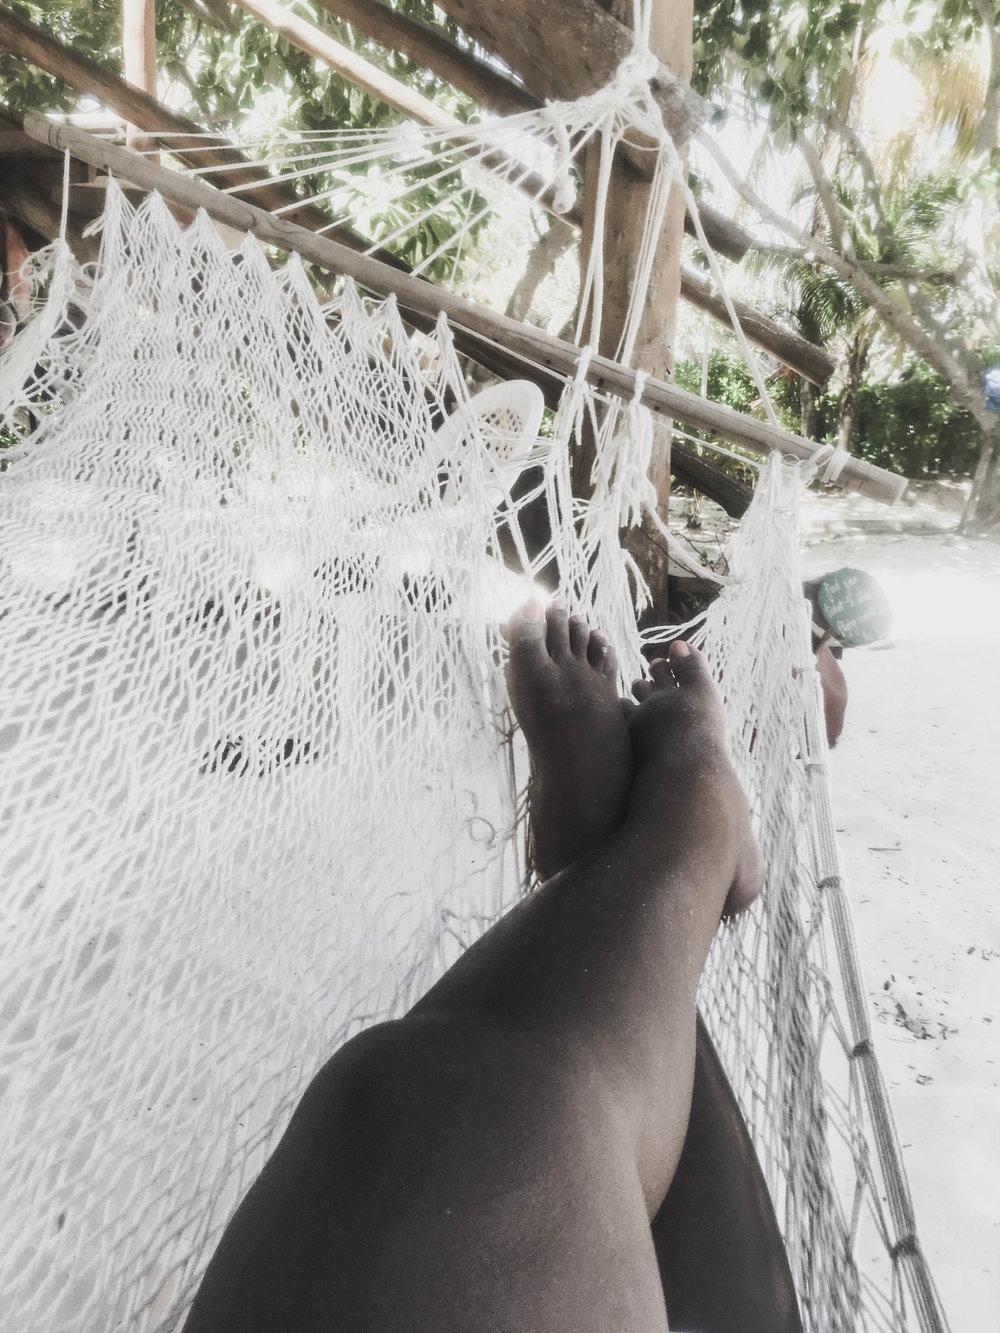 Isla mujeres hammock.jpg